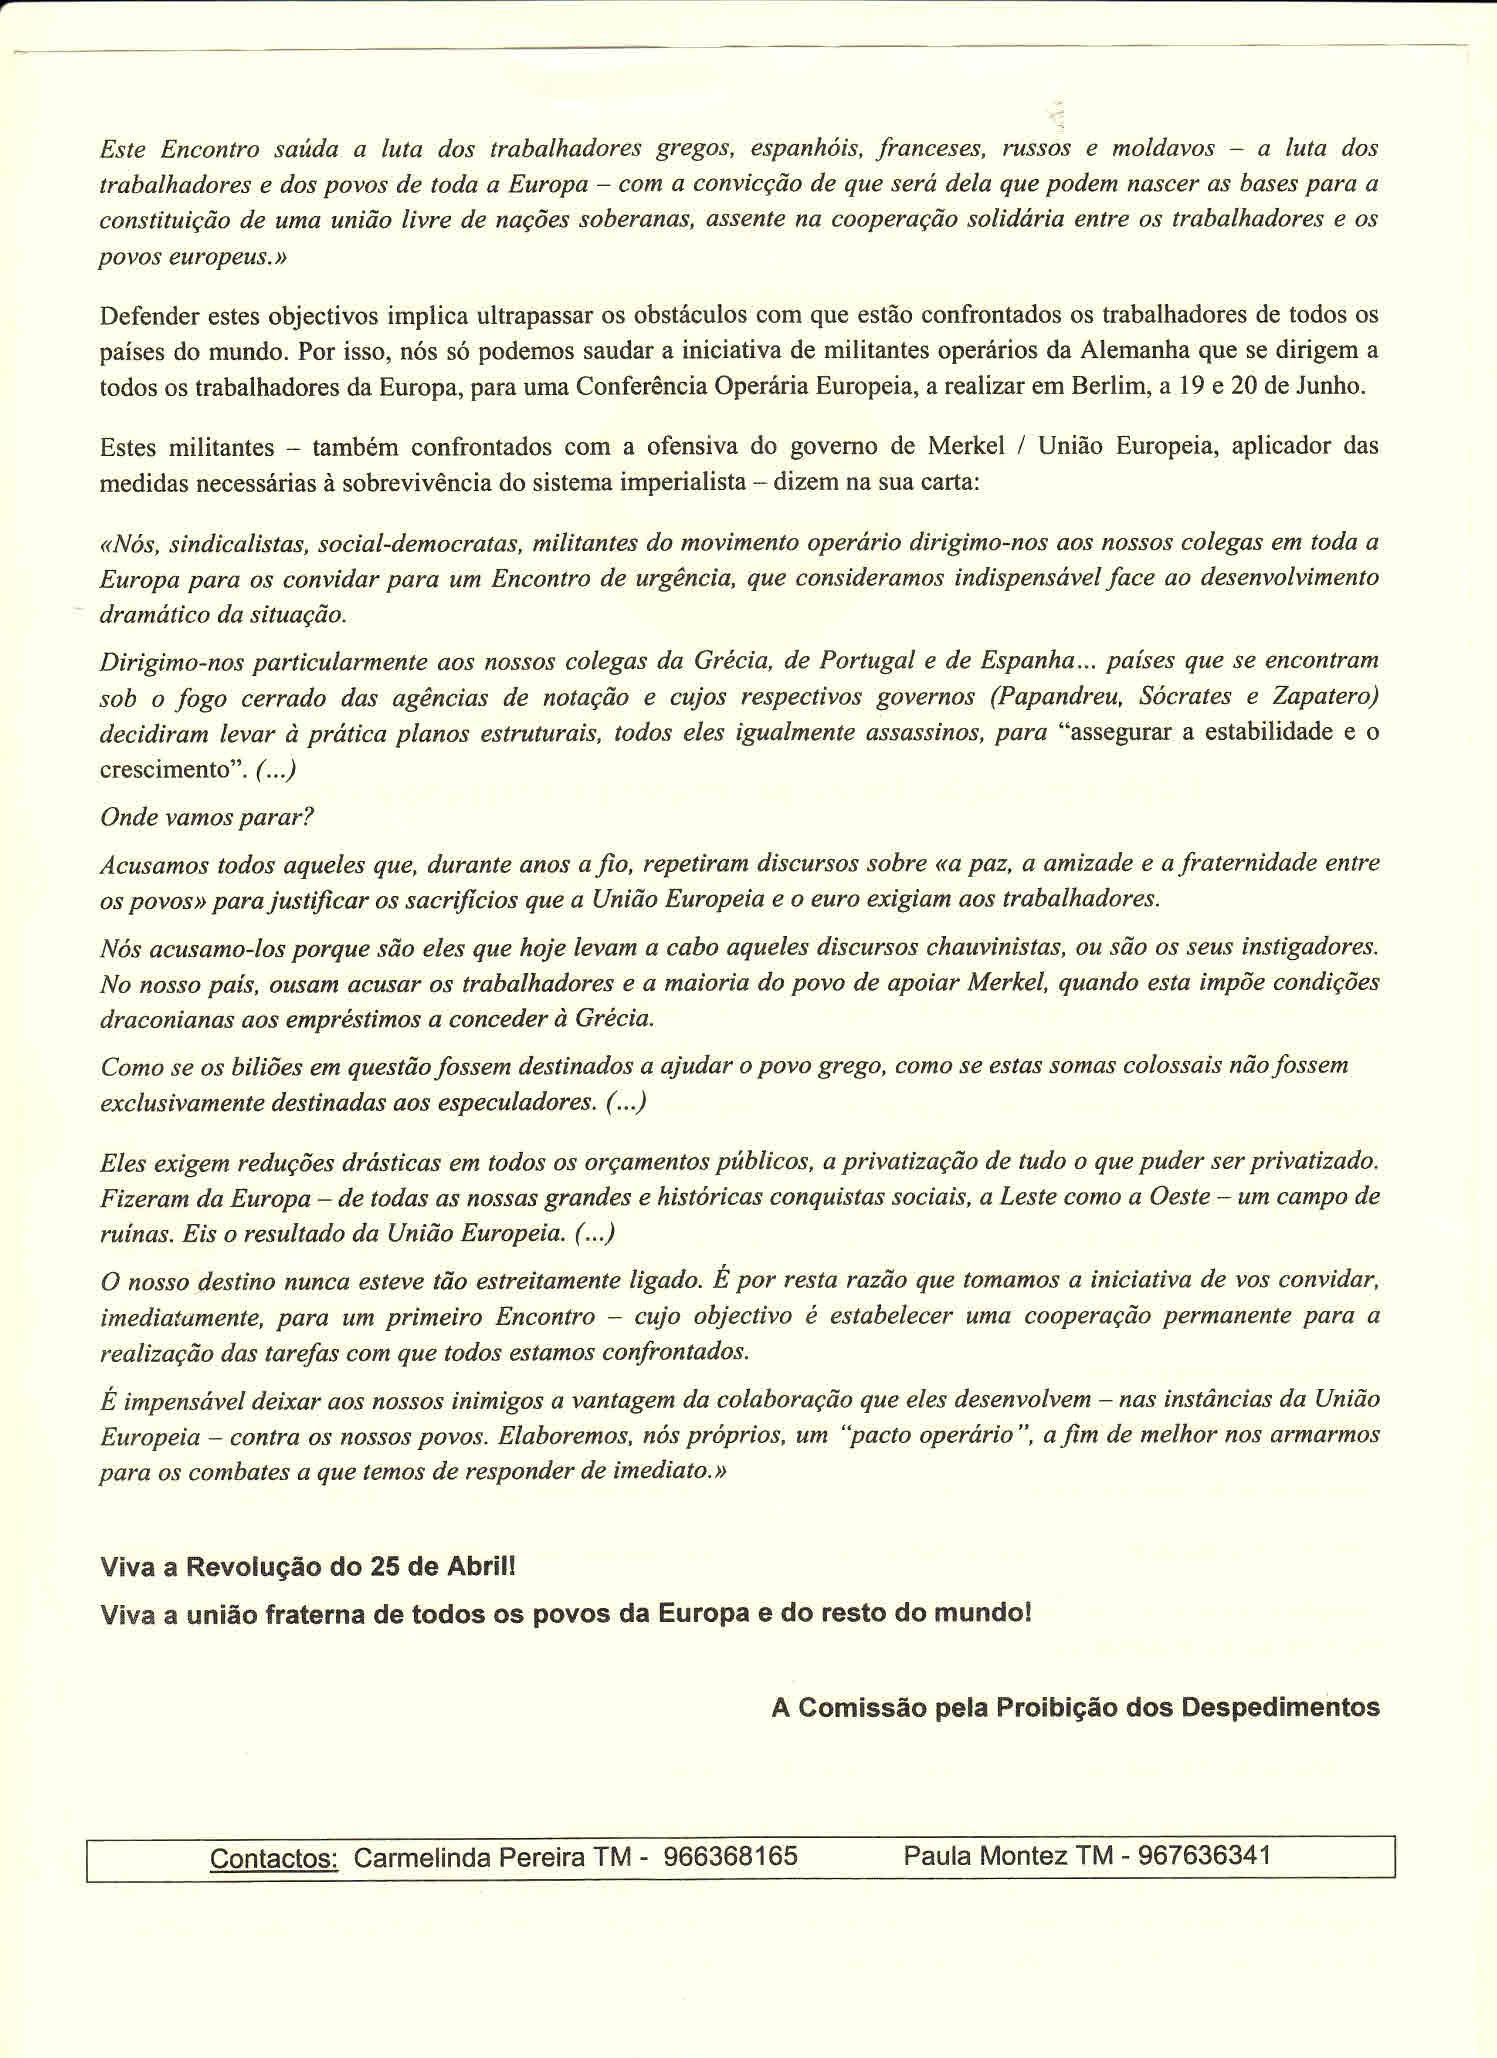 Document (35)mmmmiu 01 (2)